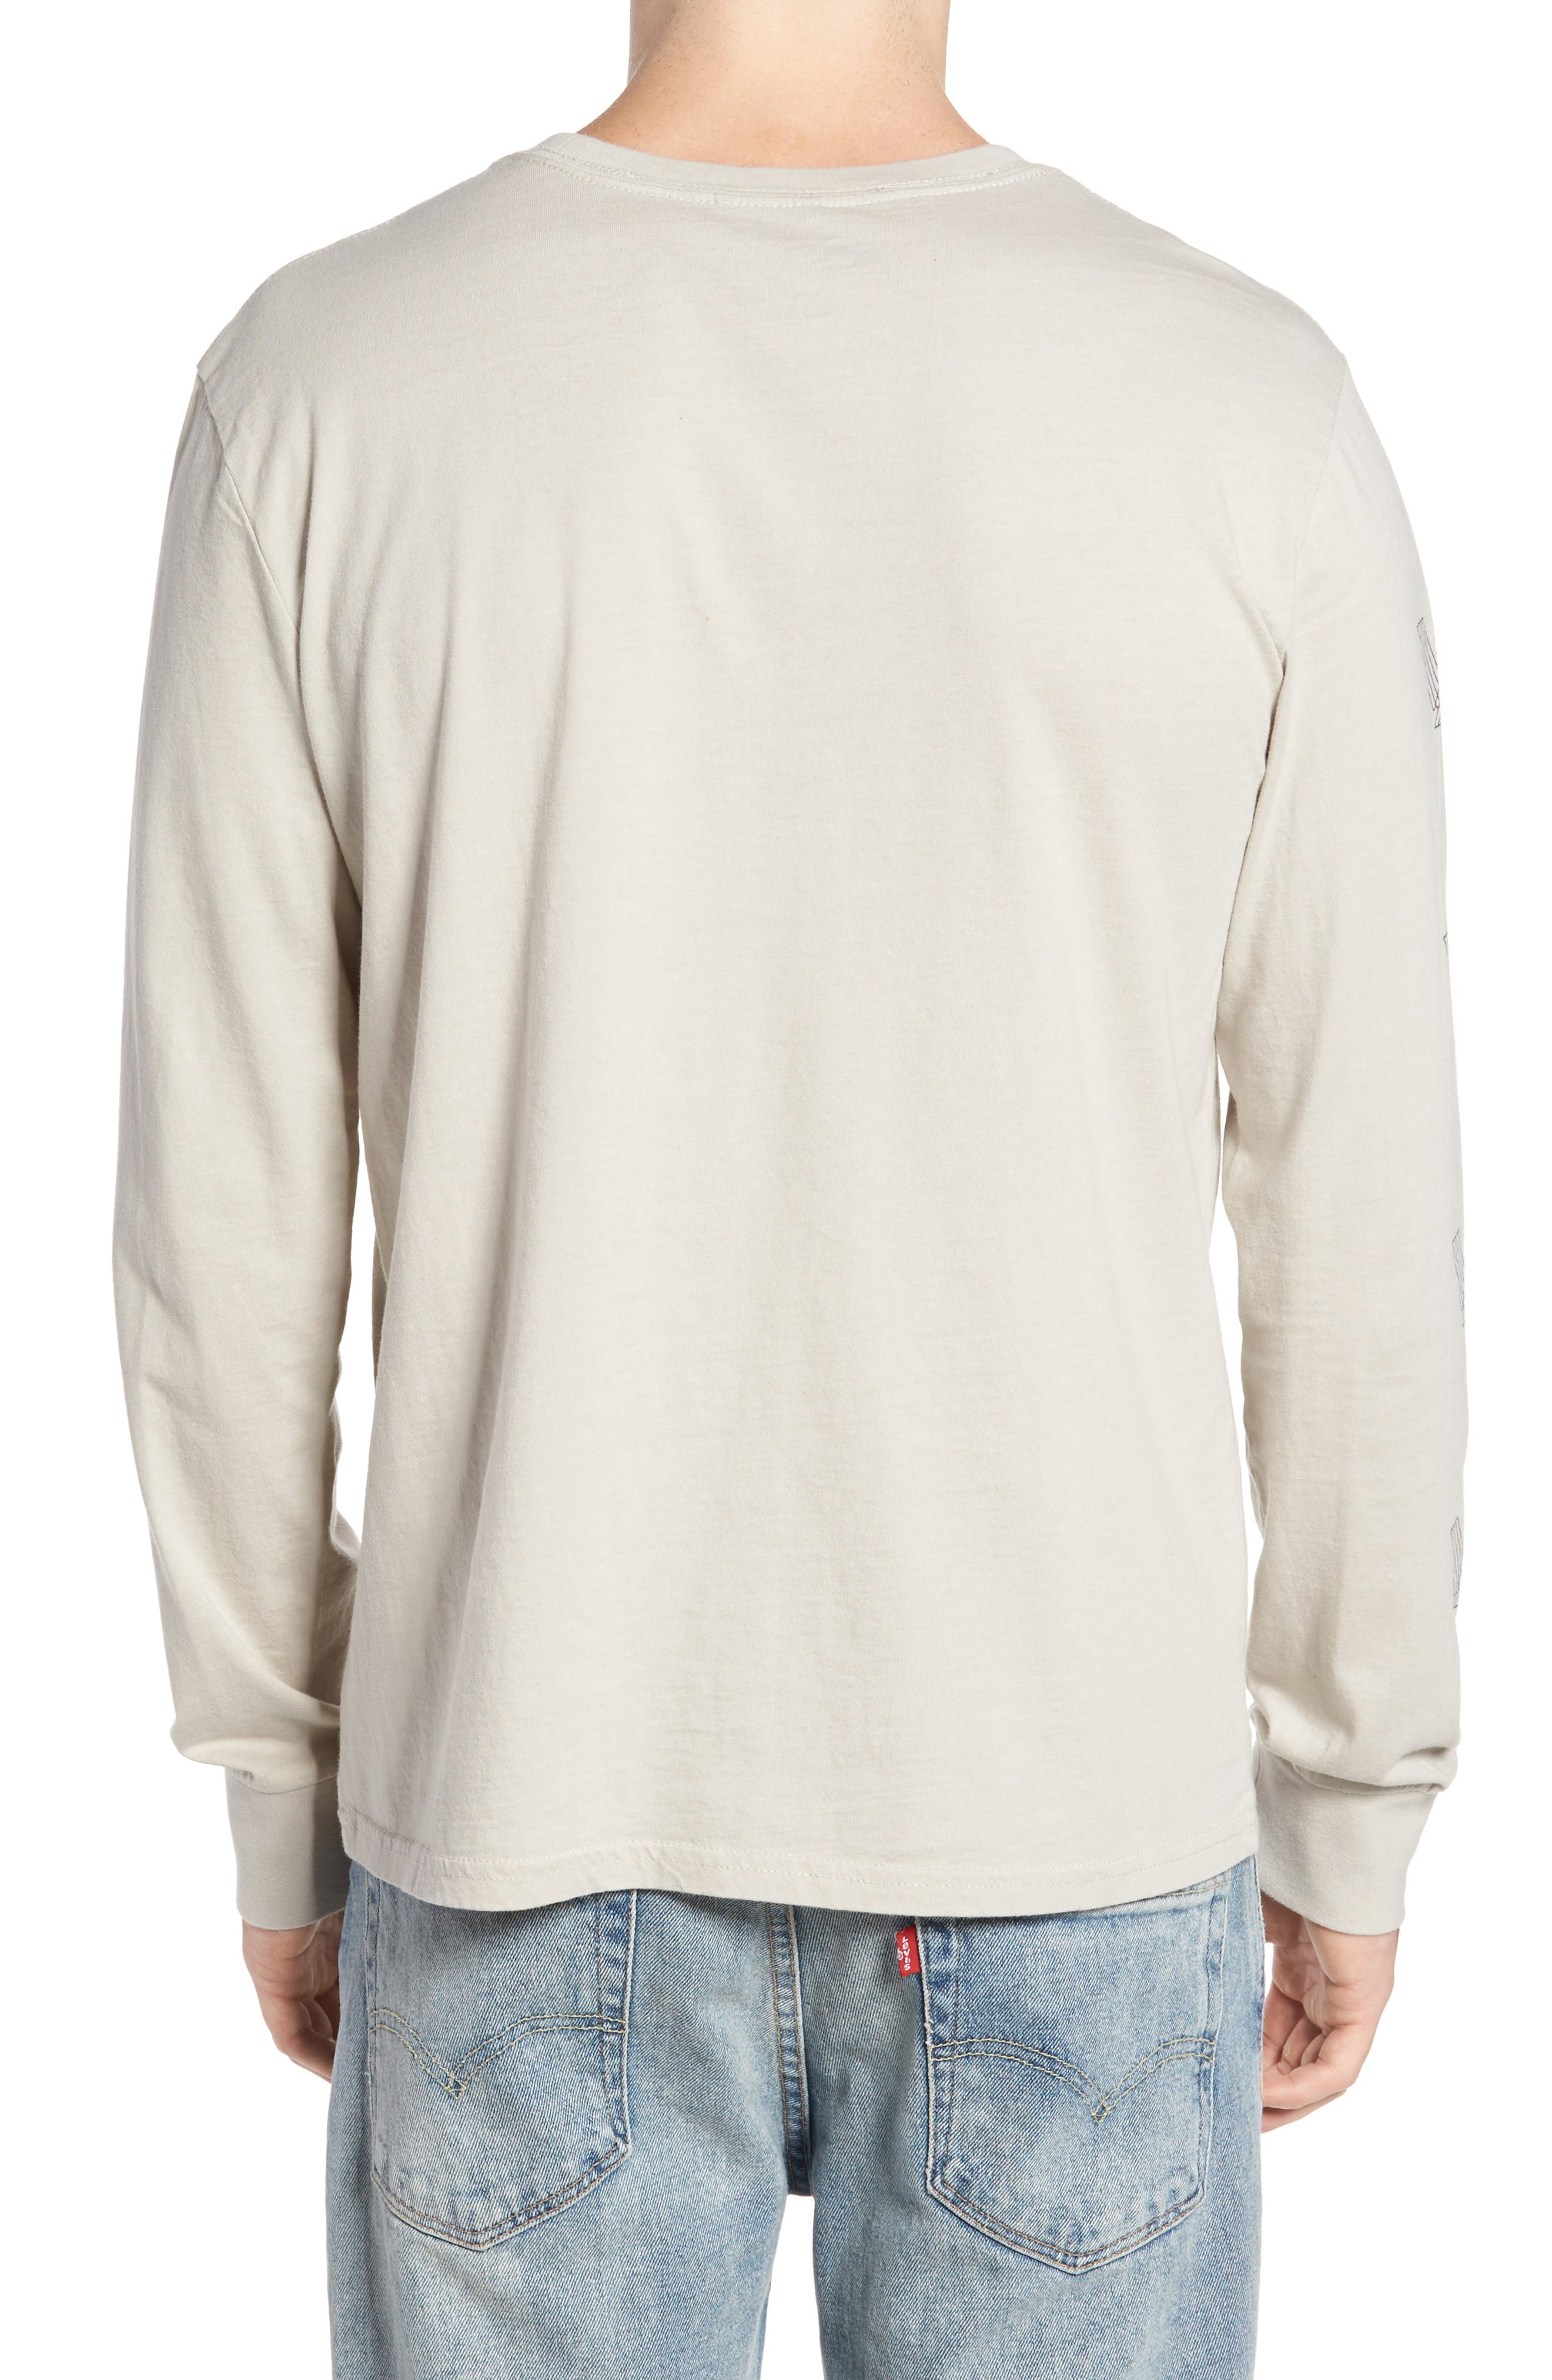 Maron Long Sleeve T-Shirt,                             Alternate thumbnail 2, color,                             020